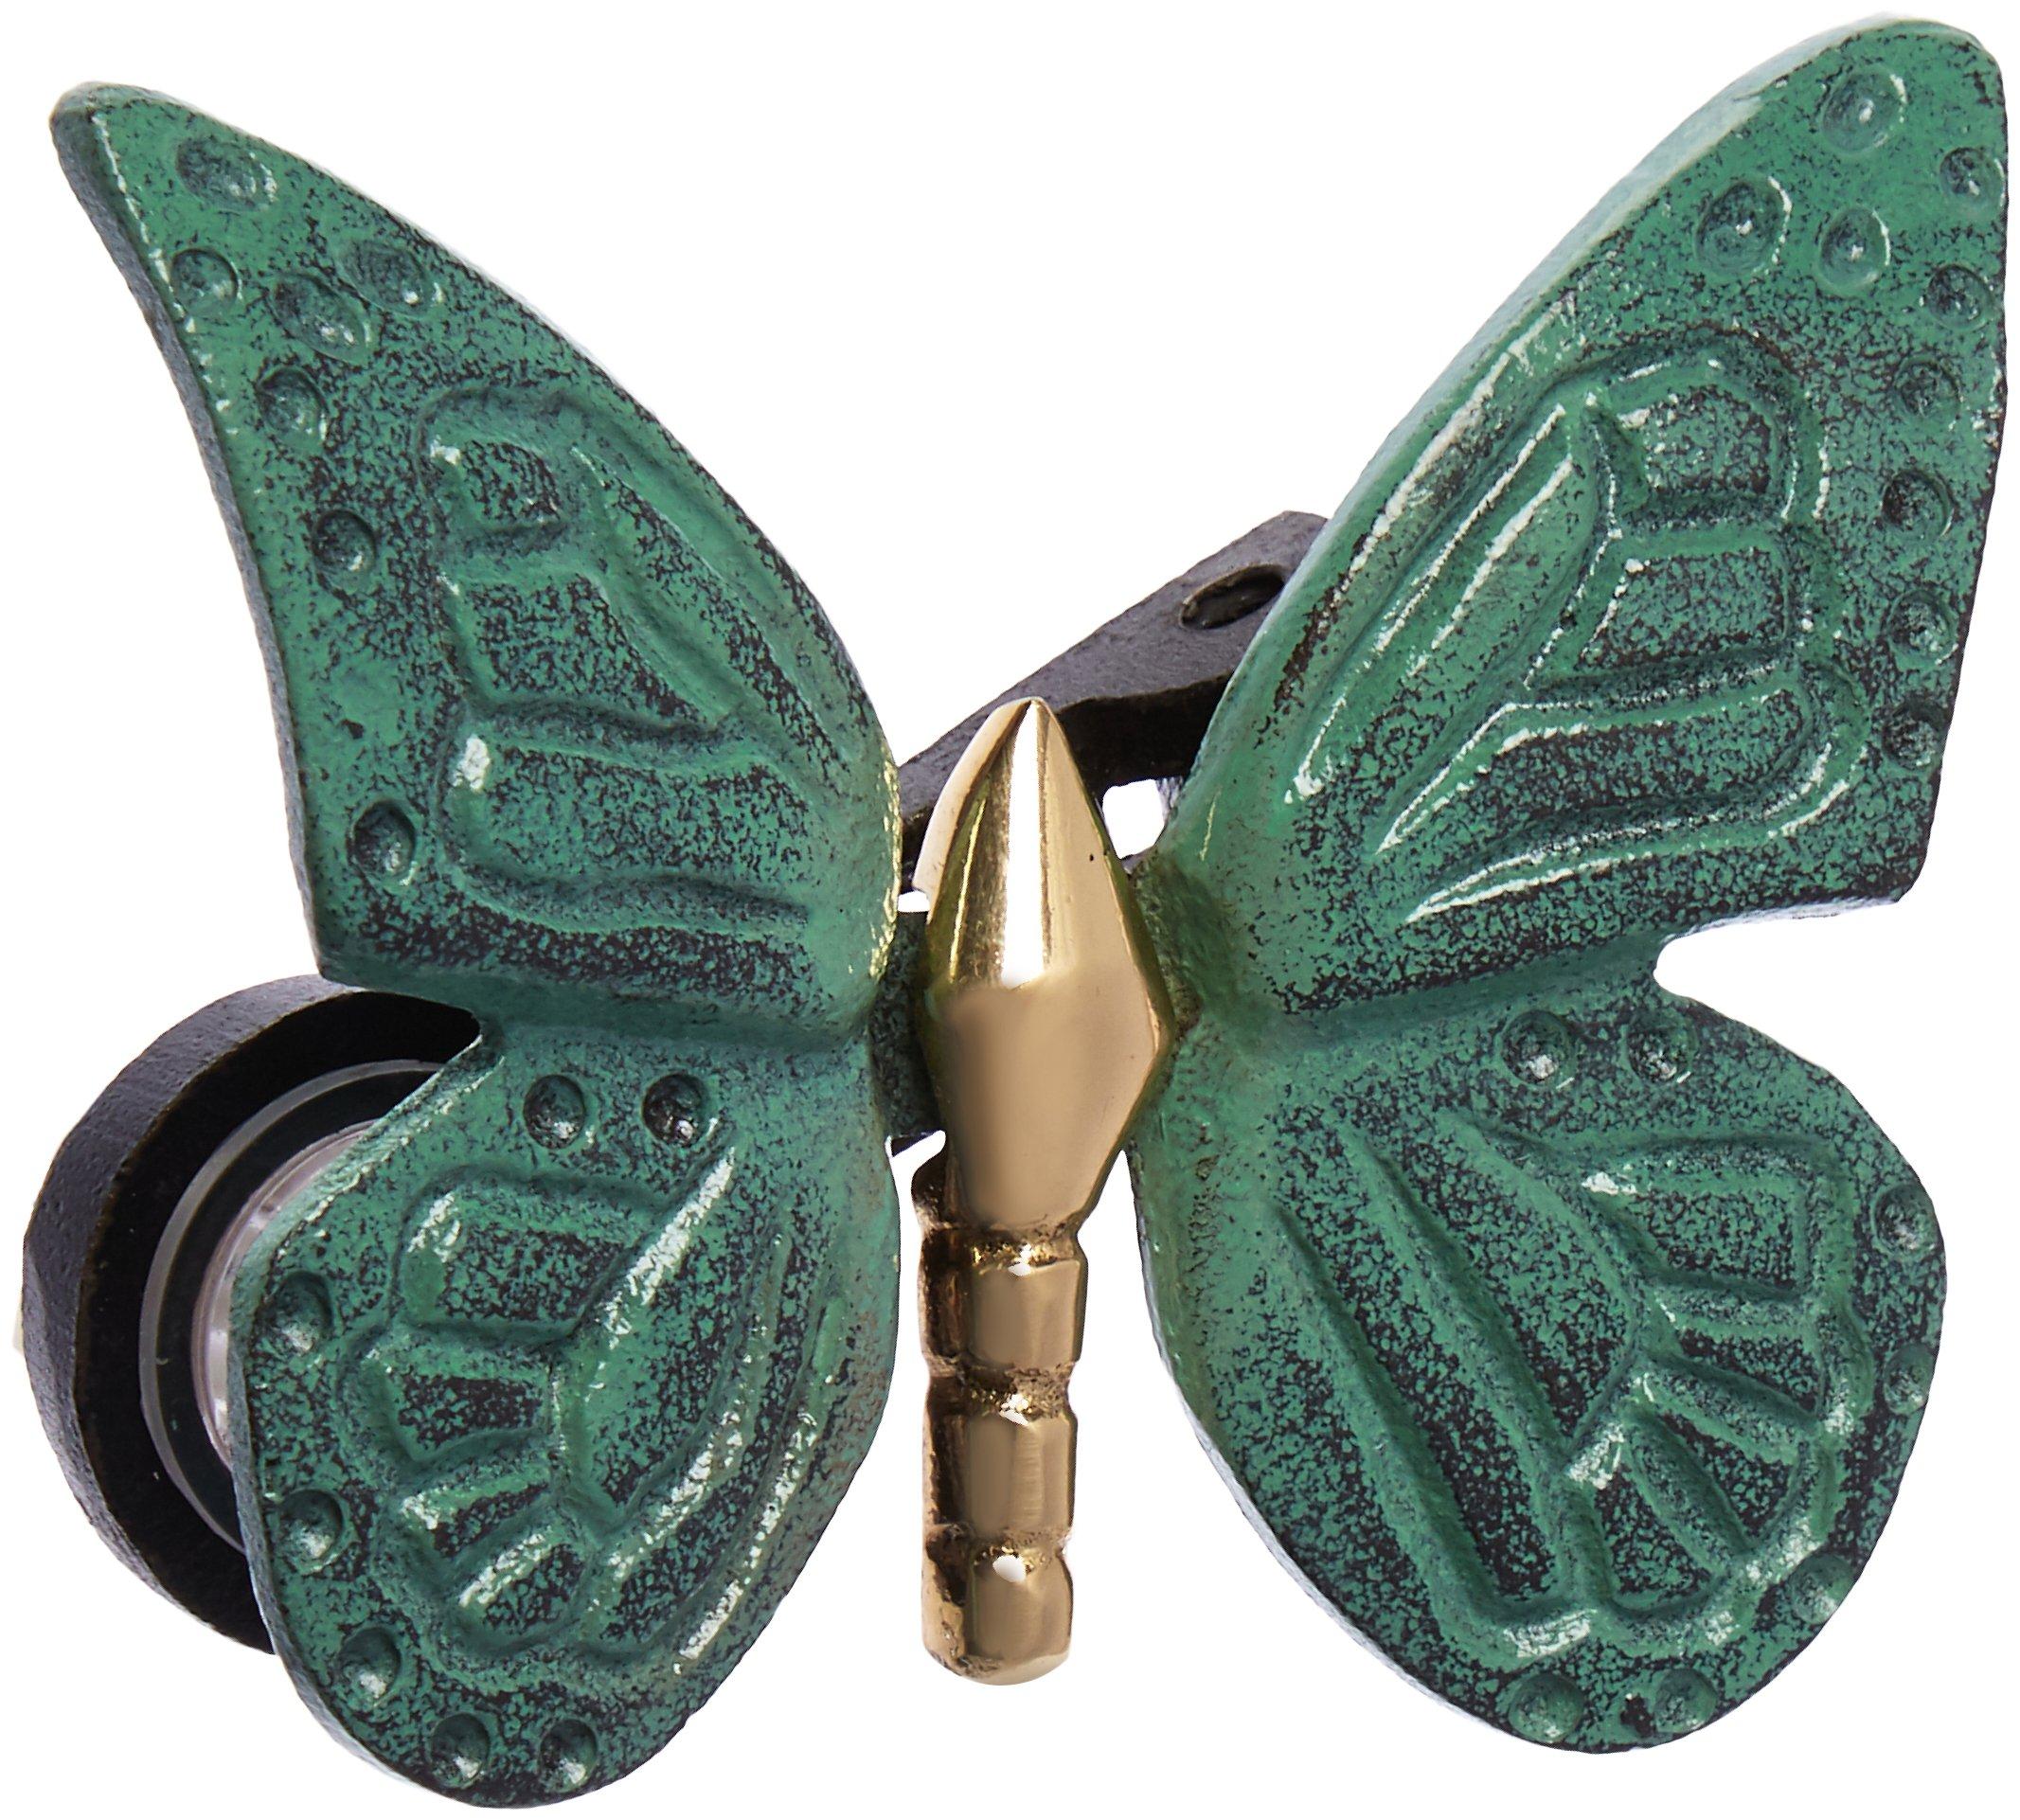 Monarch Butterfly Doorbell Ringer - Brass/Green Patina